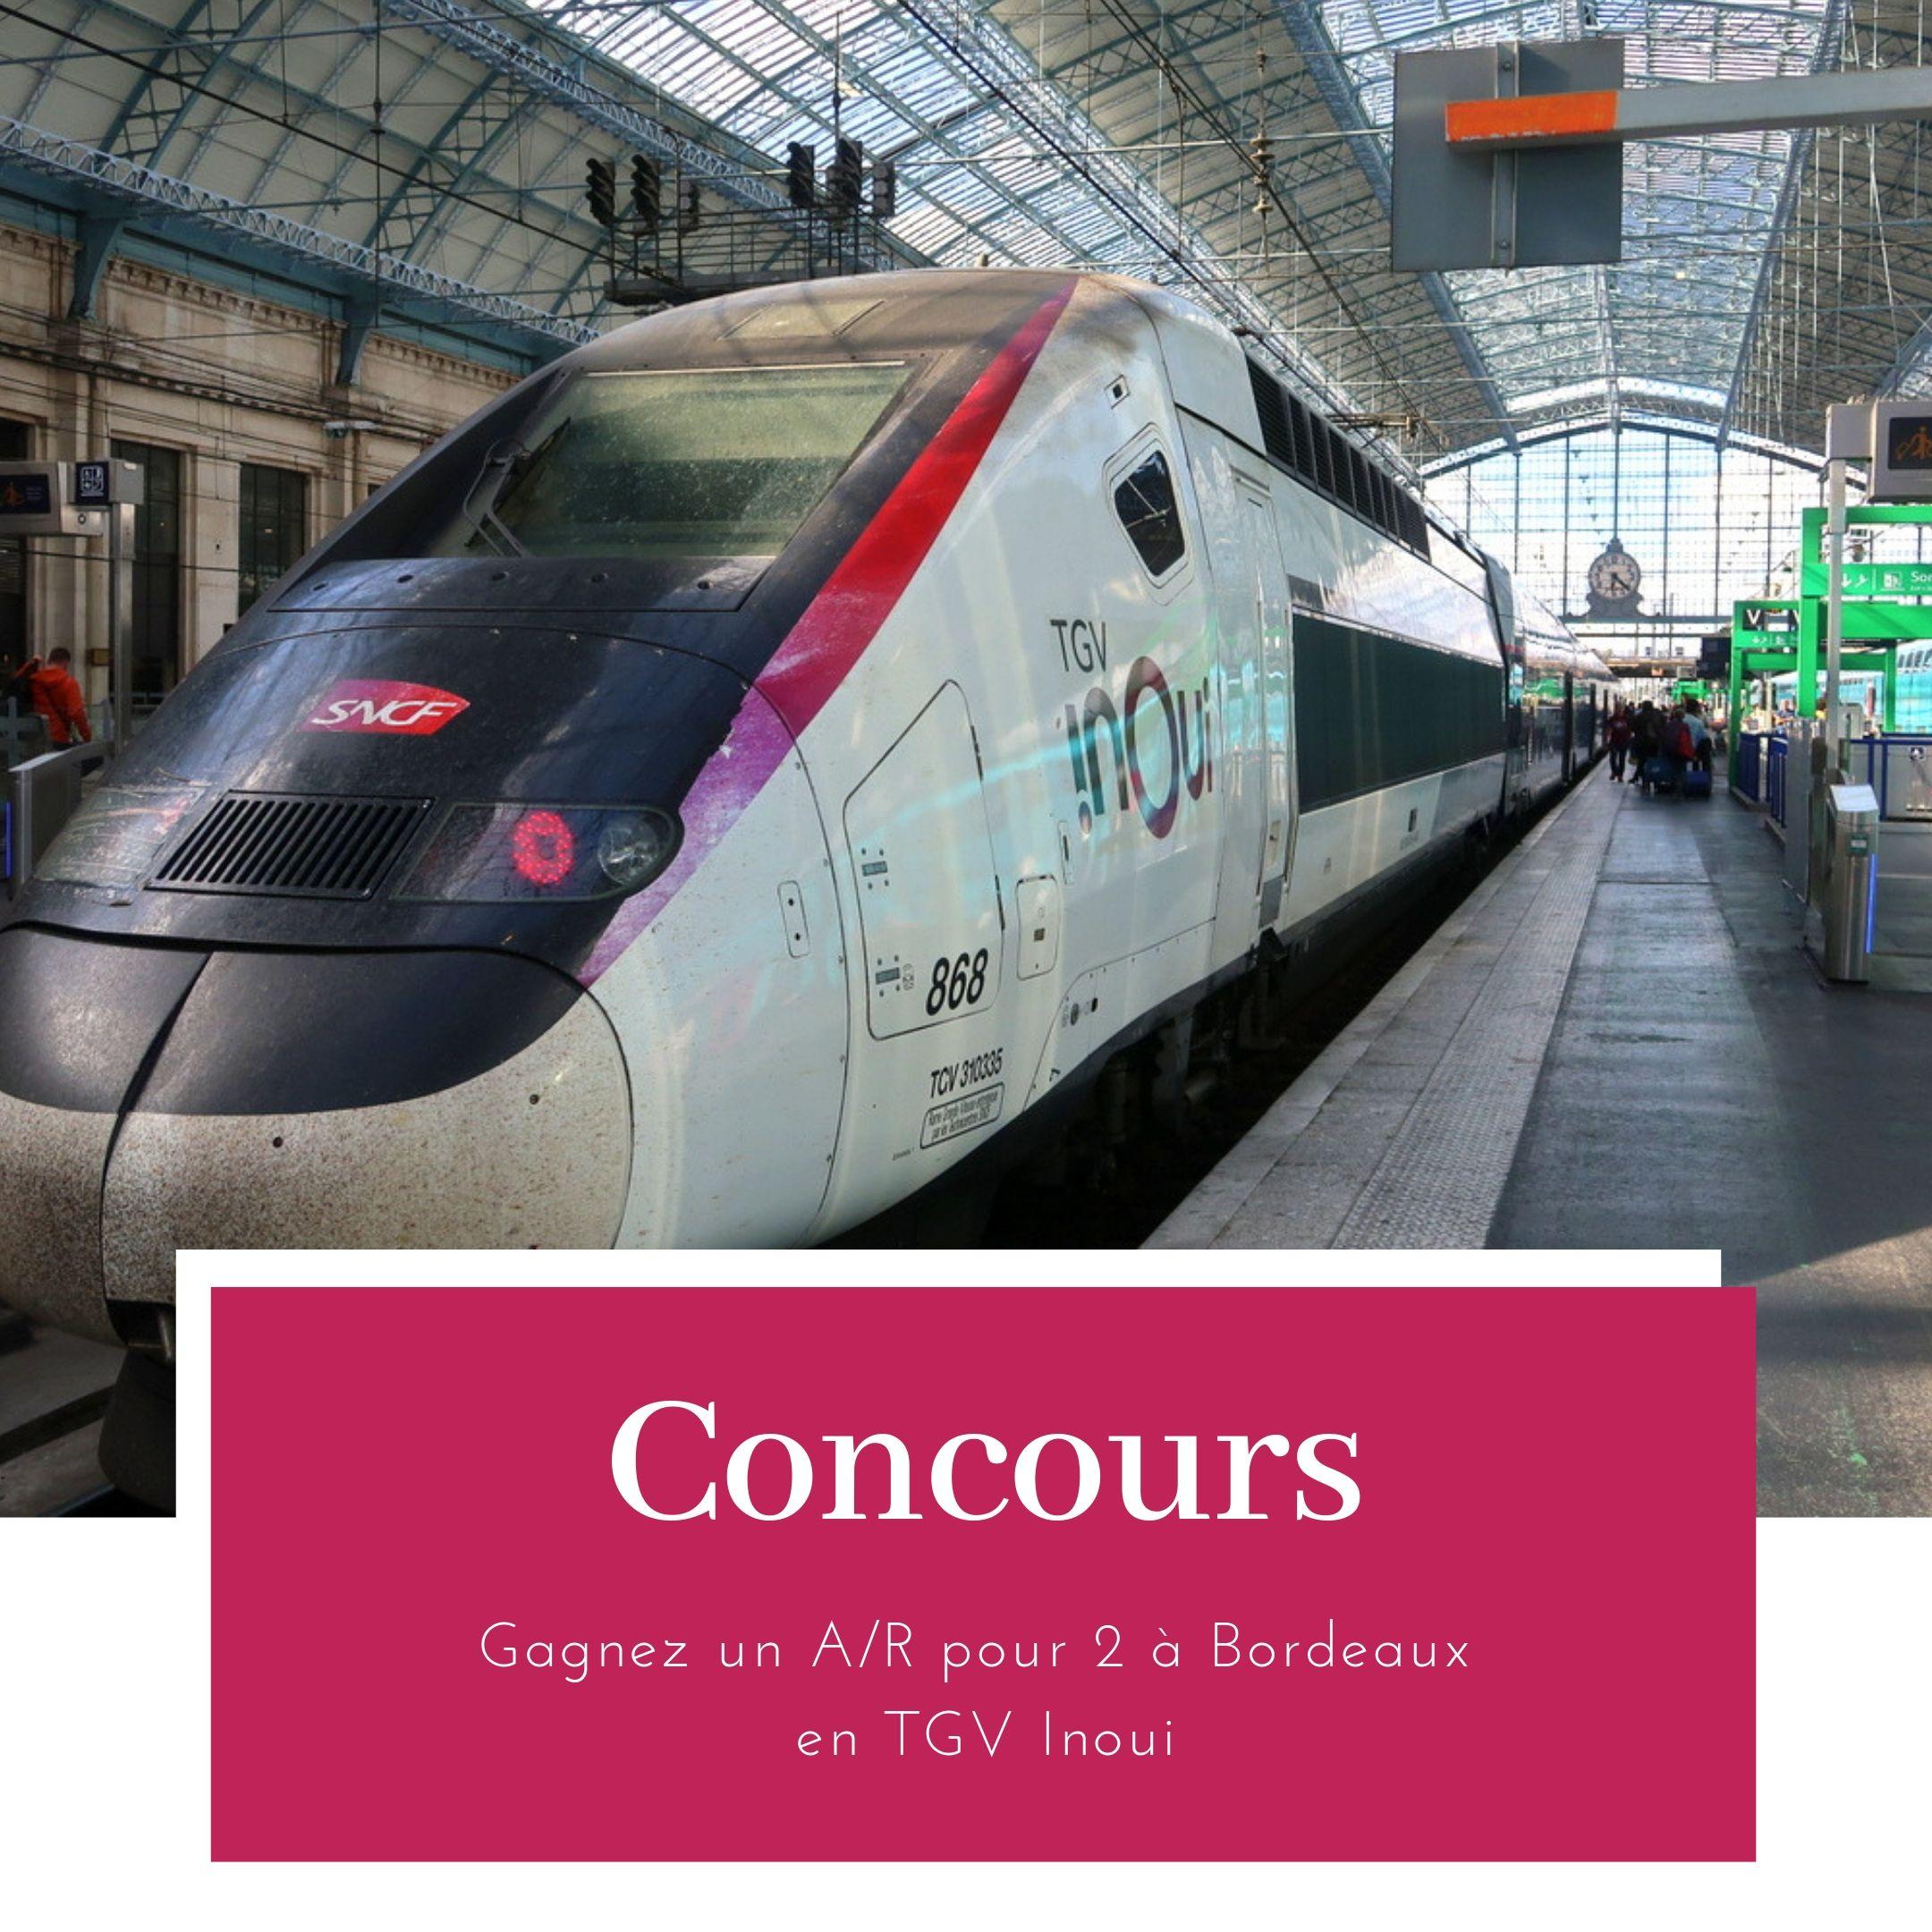 Concours TGV Inoui